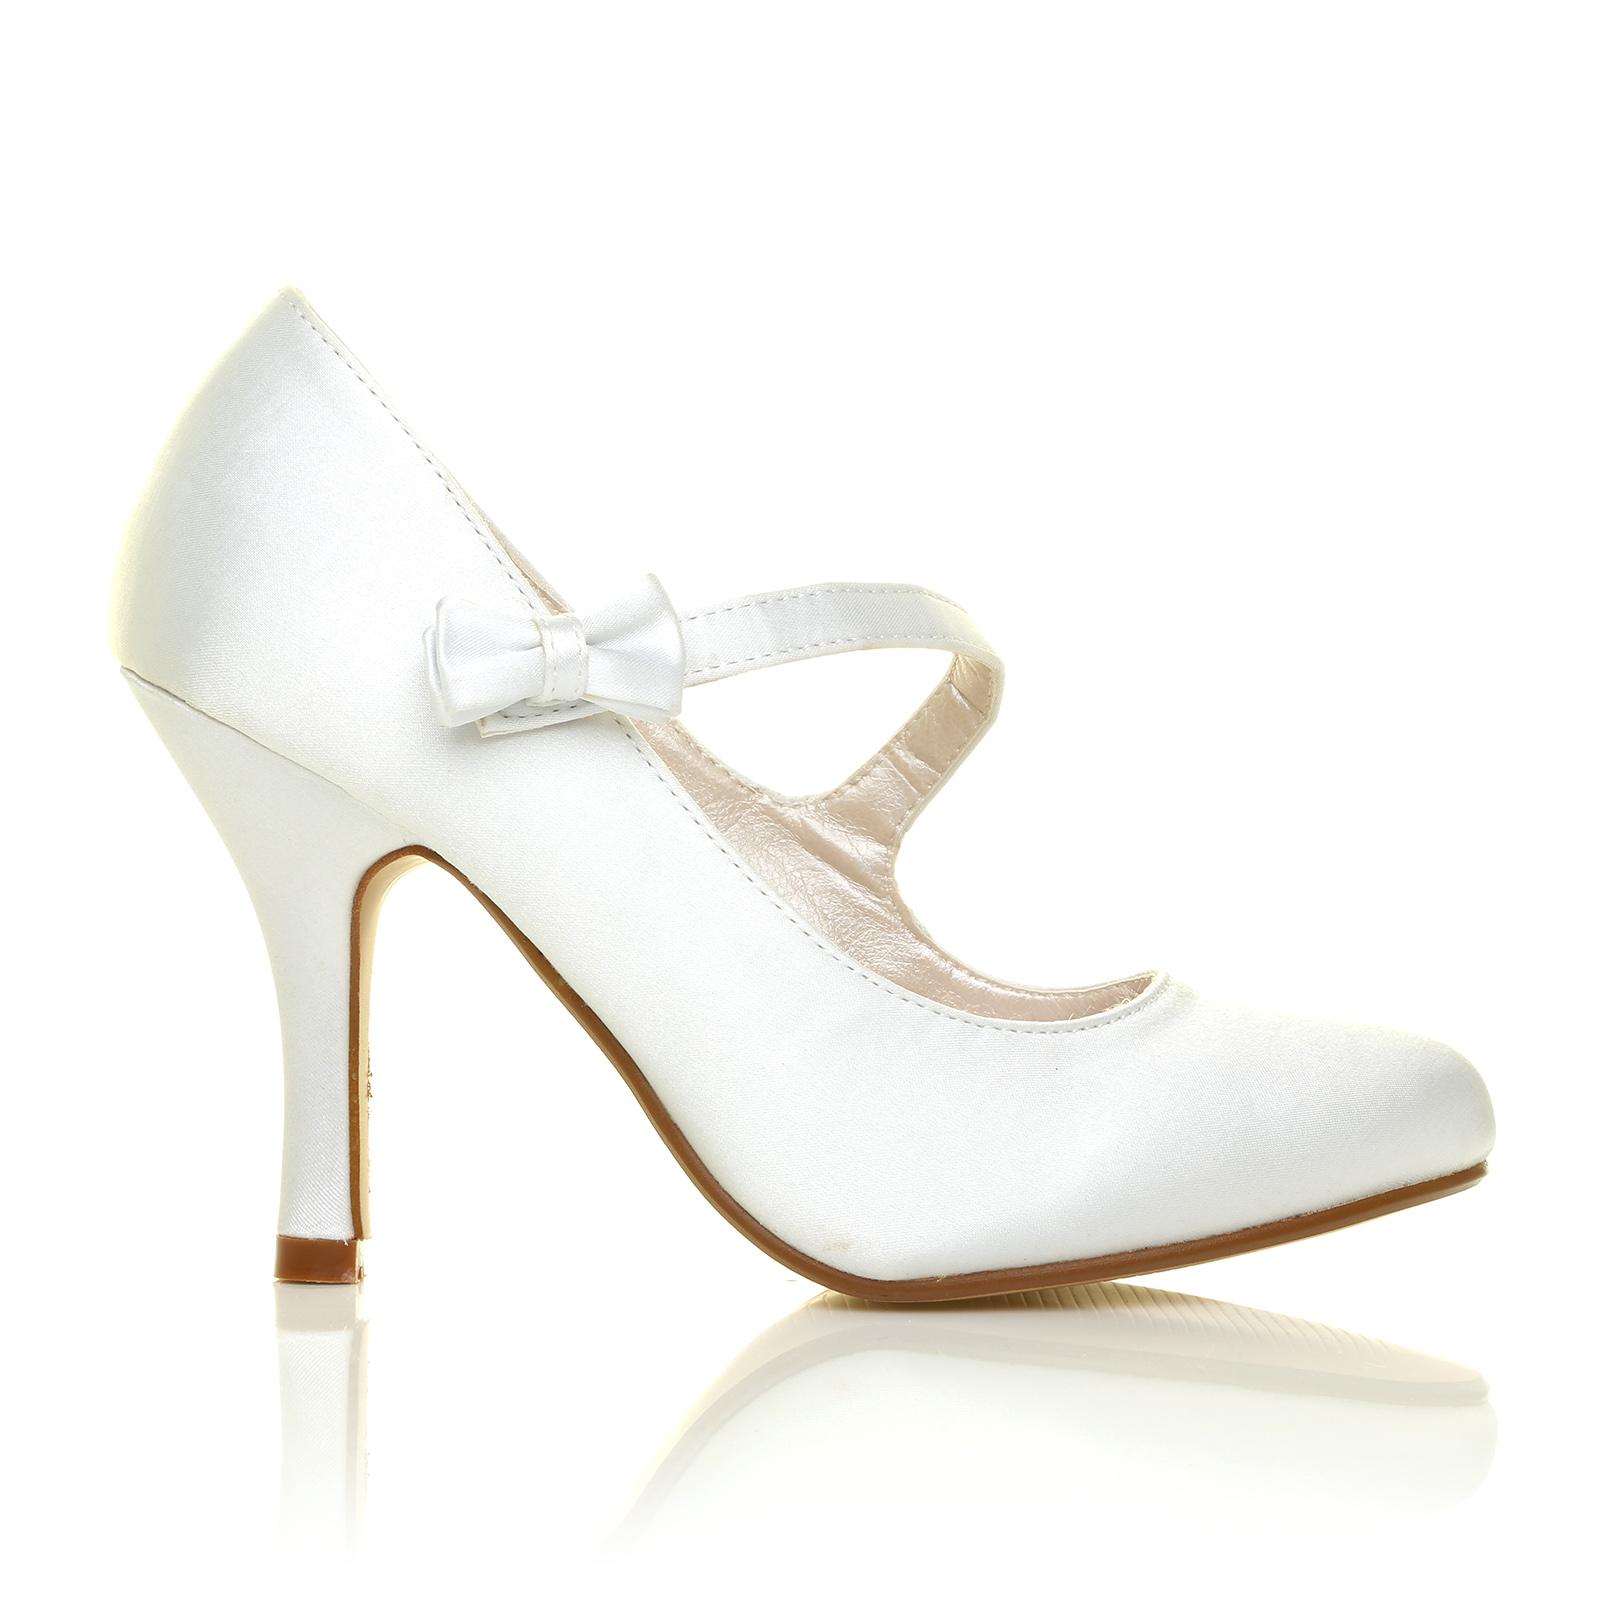 LADIES WHITE IVORY HI HEEL SATIN MARY JANE PUMPS WOMENS ...